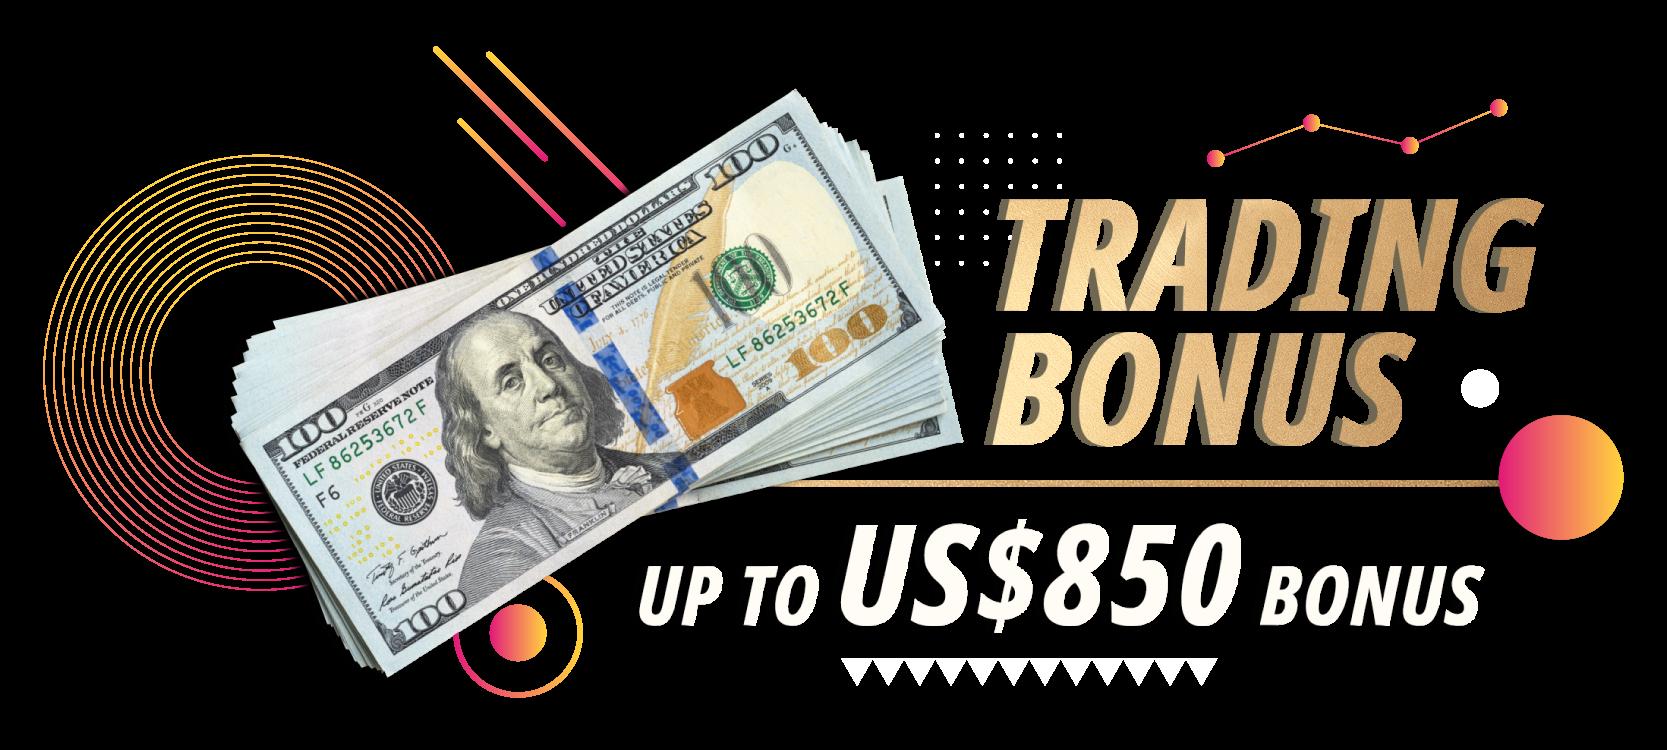 Trading Bonus Get Up To US$850 Bonus